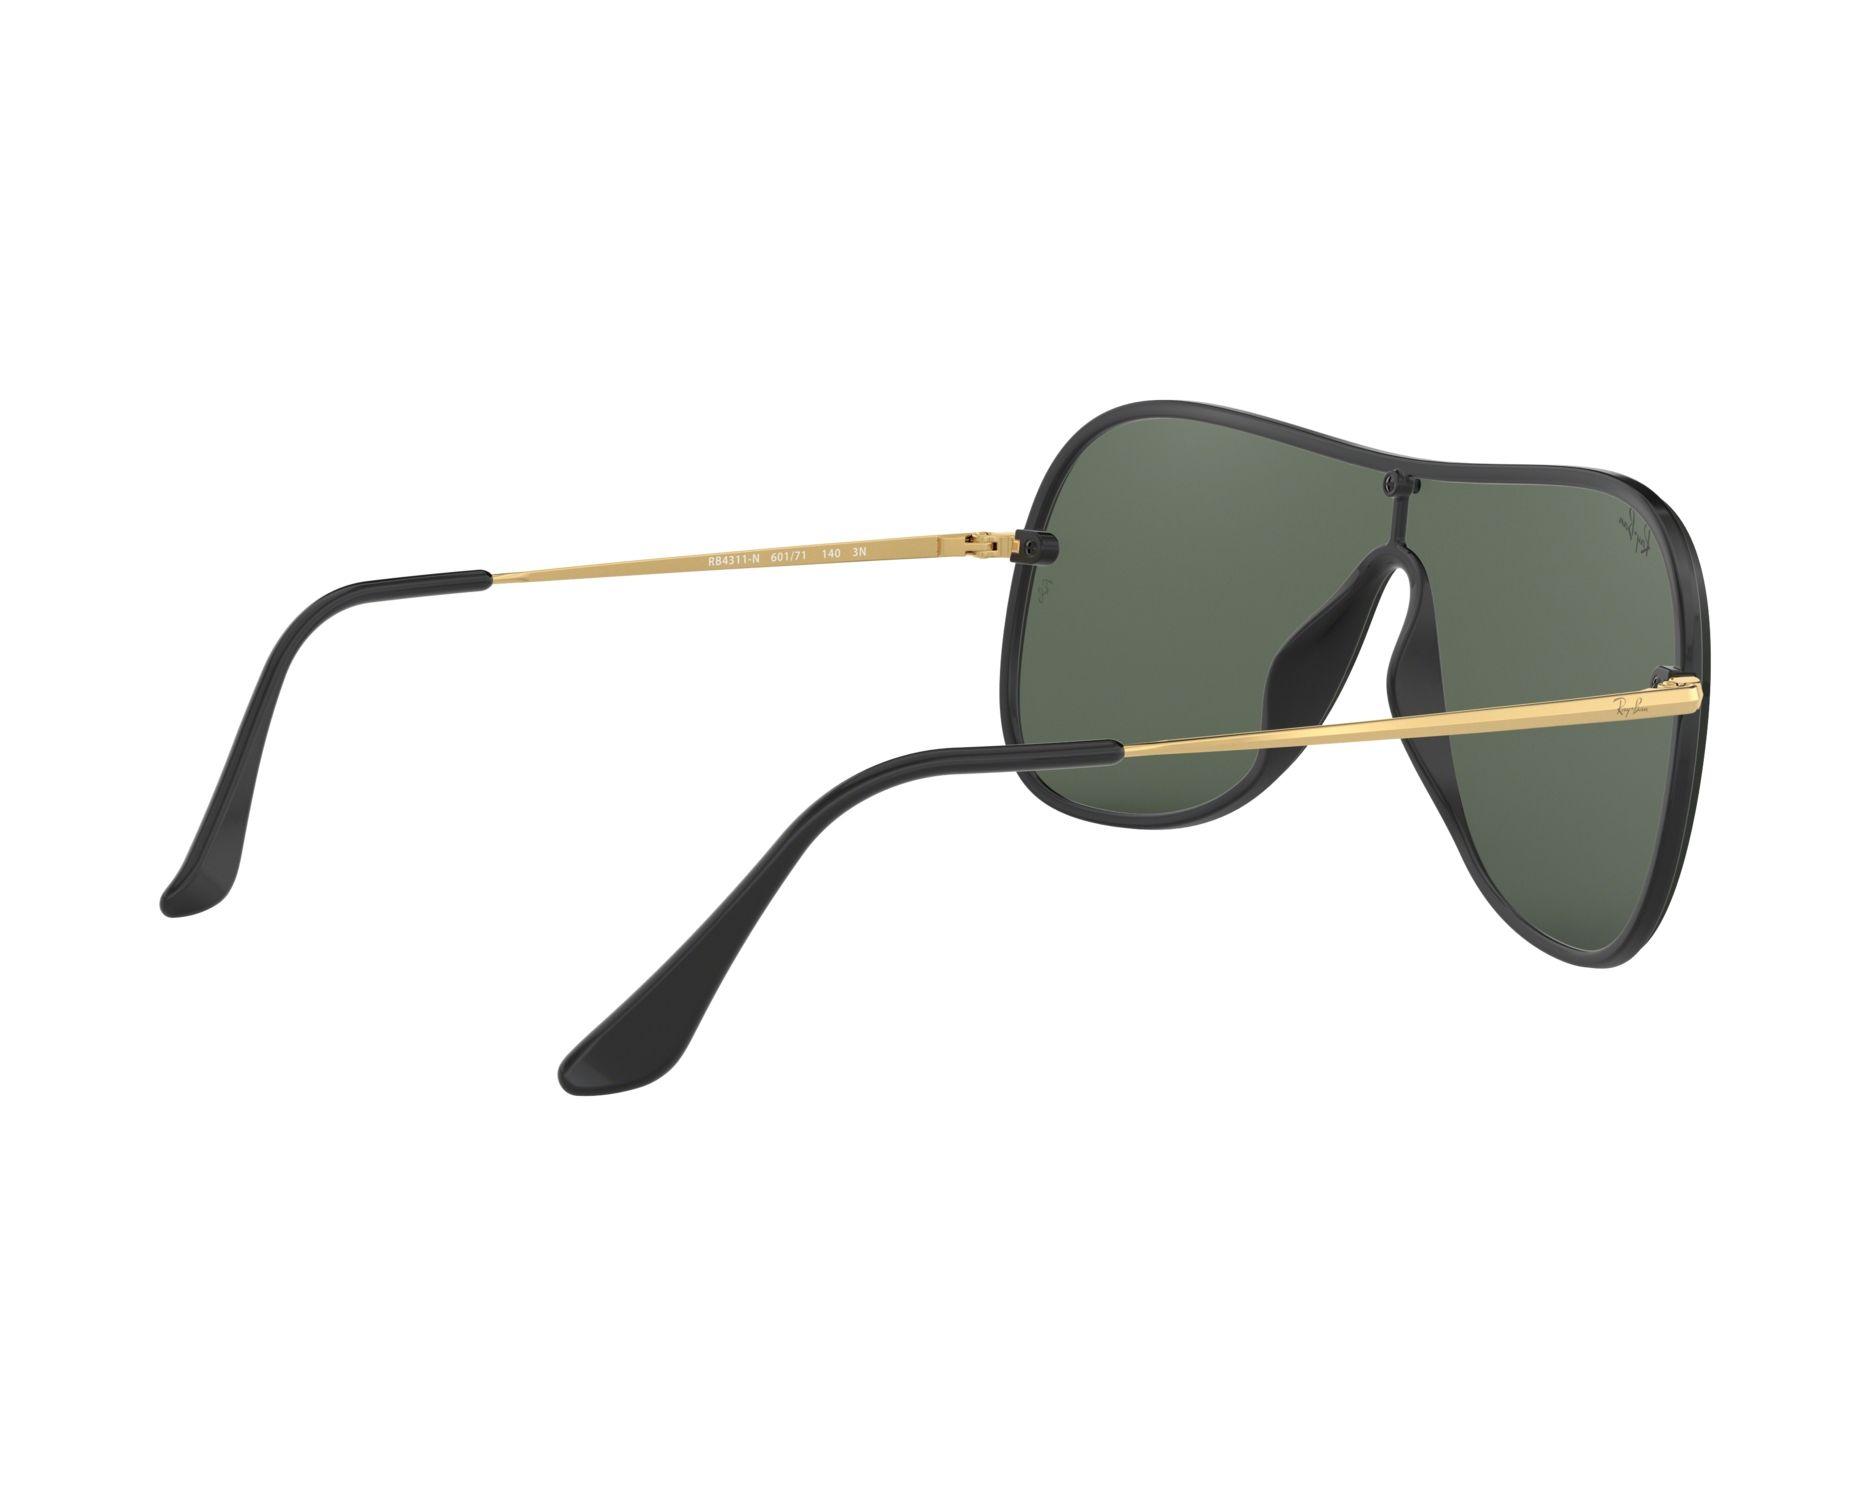 069b6ec80d Sunglasses Ray-Ban RB-4311-N 601 71 63-18 Black